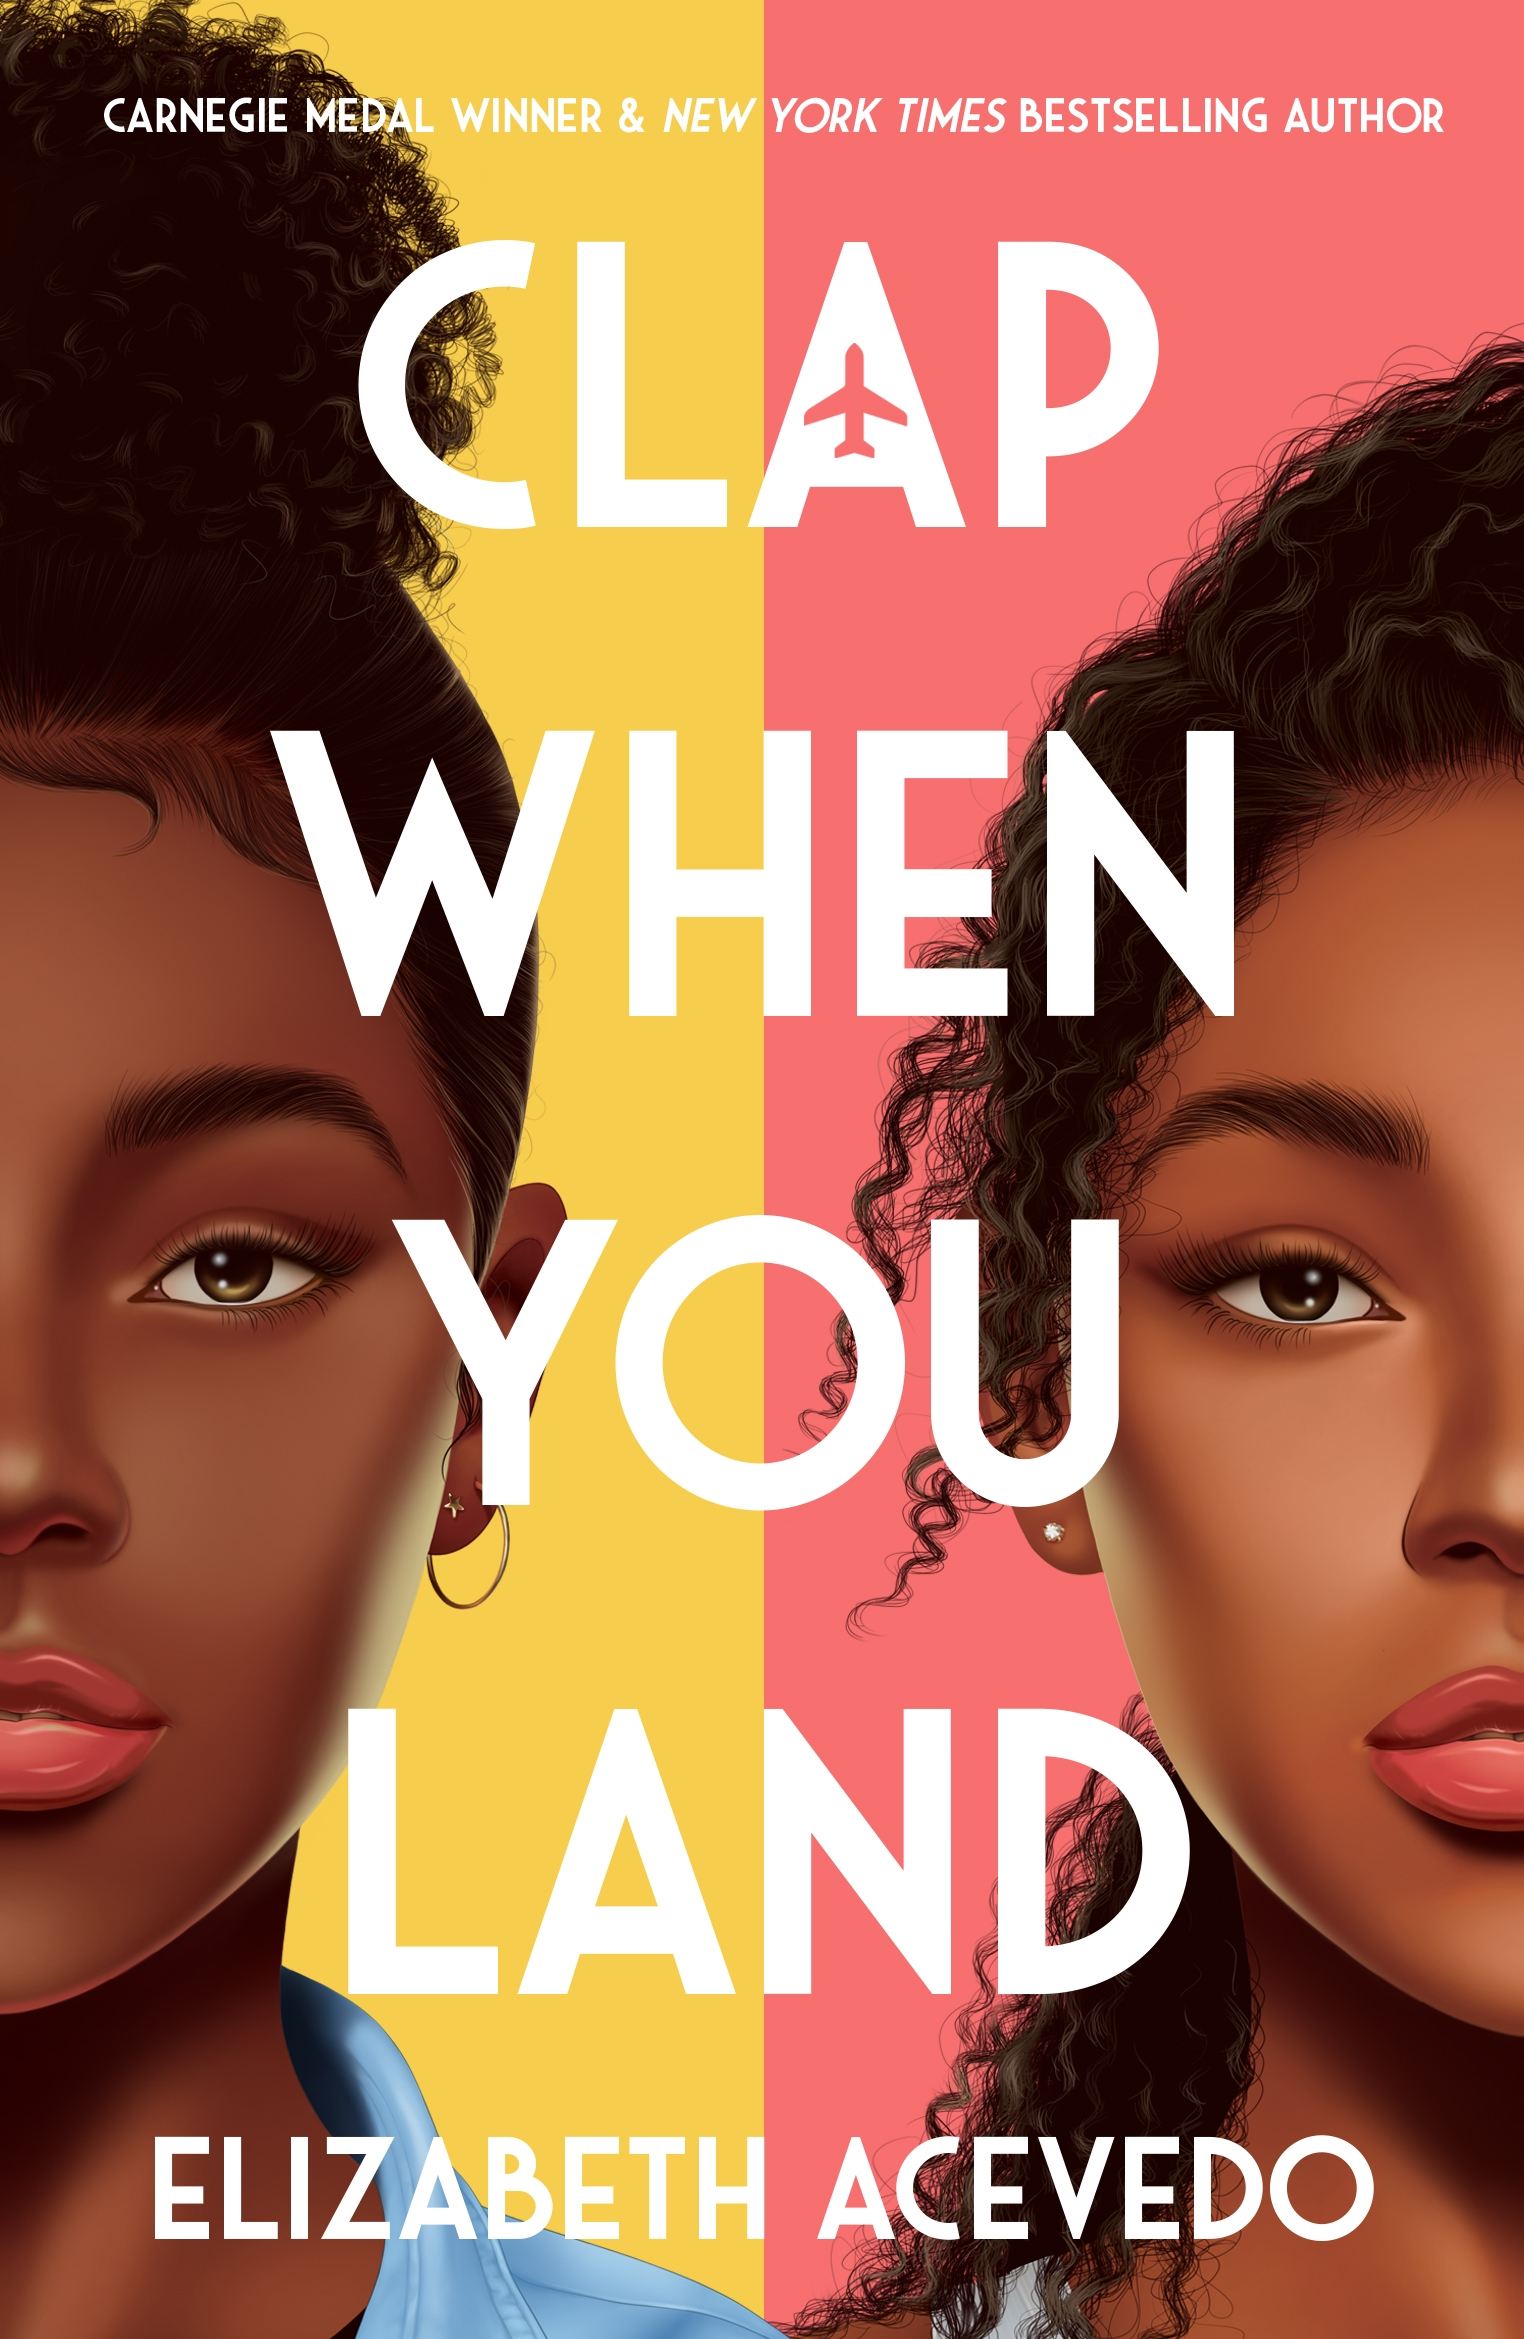 https://carnegiegreenaway.org.uk/wp-content/uploads/2021/02/Clap-When-You-Land.jpg